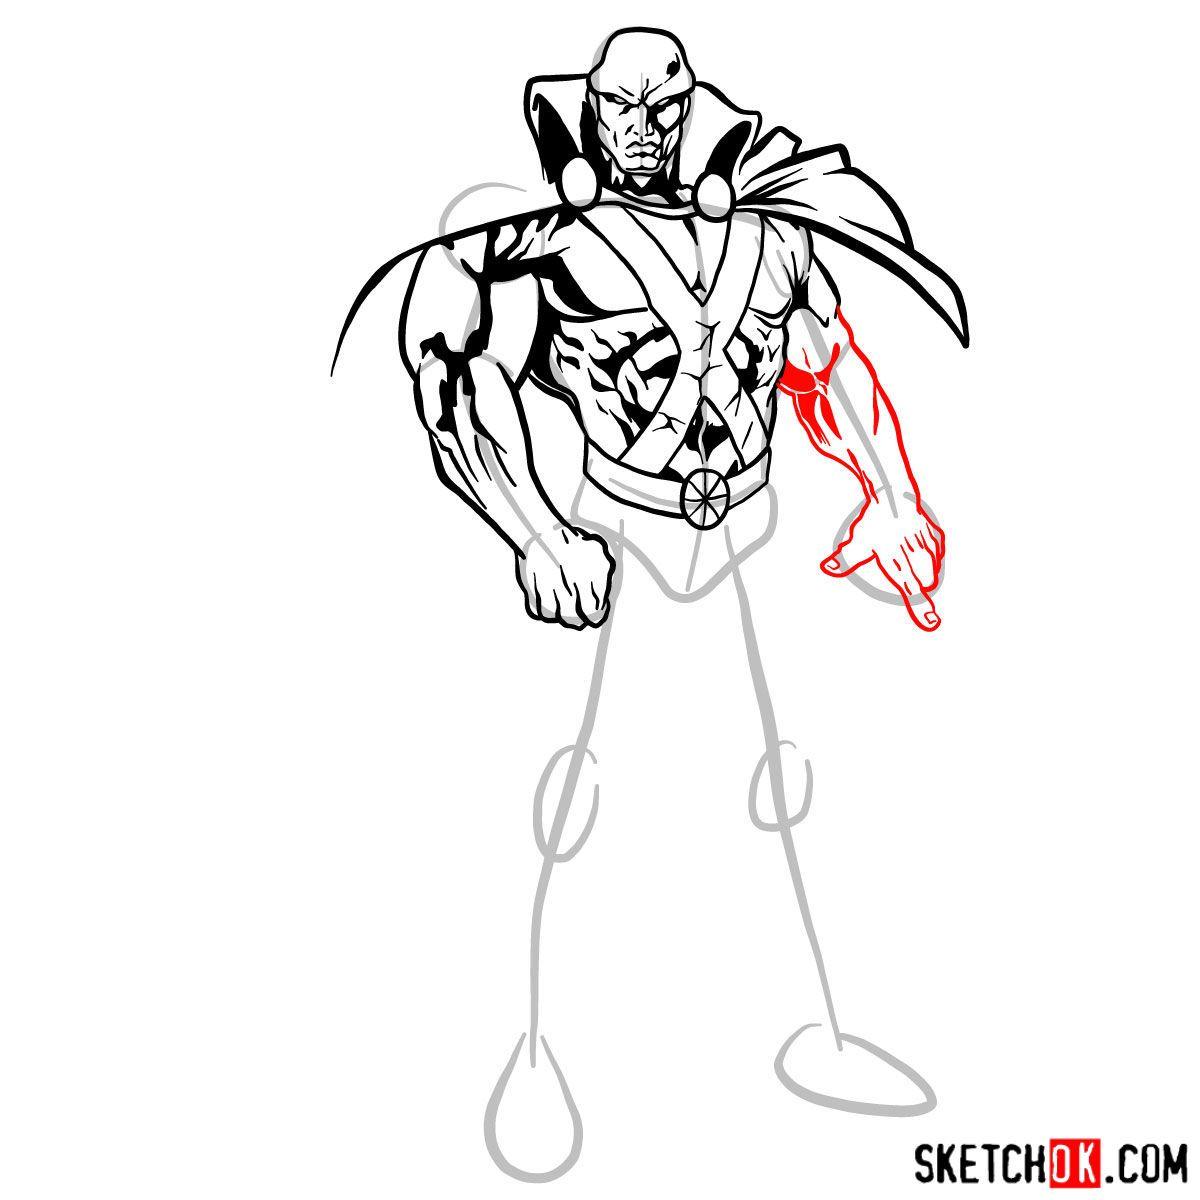 How To Draw The Martian Manhunter Sketchok Step By Step Drawing Tutorials In 2021 The Martian Martian Manhunter Drawings